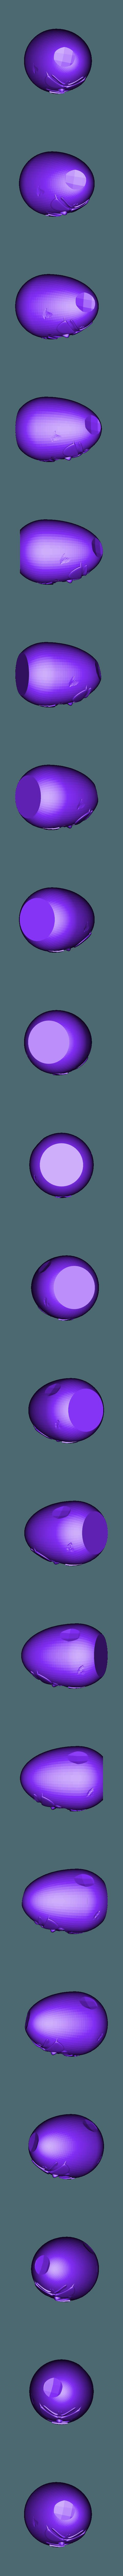 Rotton_Guy_1.stl Download free STL file Rotton Eggs! • 3D printer model, 8ran